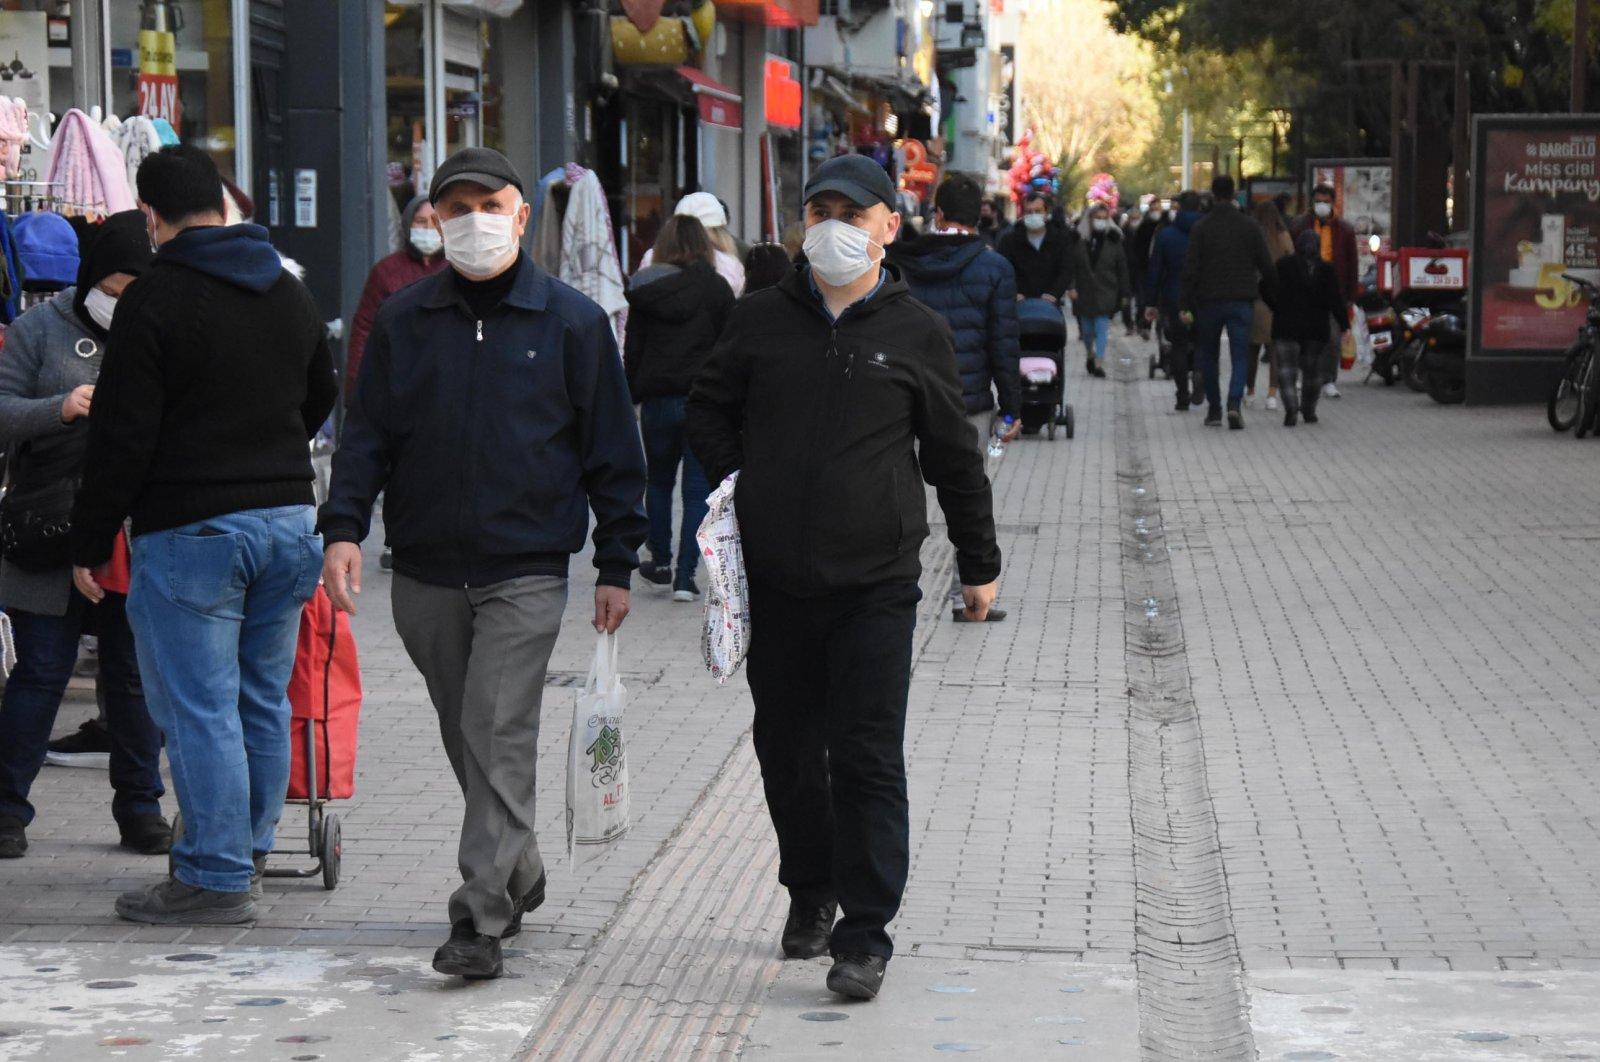 People wearing protective masks against COVID-19 walk on a street, Eskişehir, central Turkey, Nov. 7, 2020. (DHA Photo)